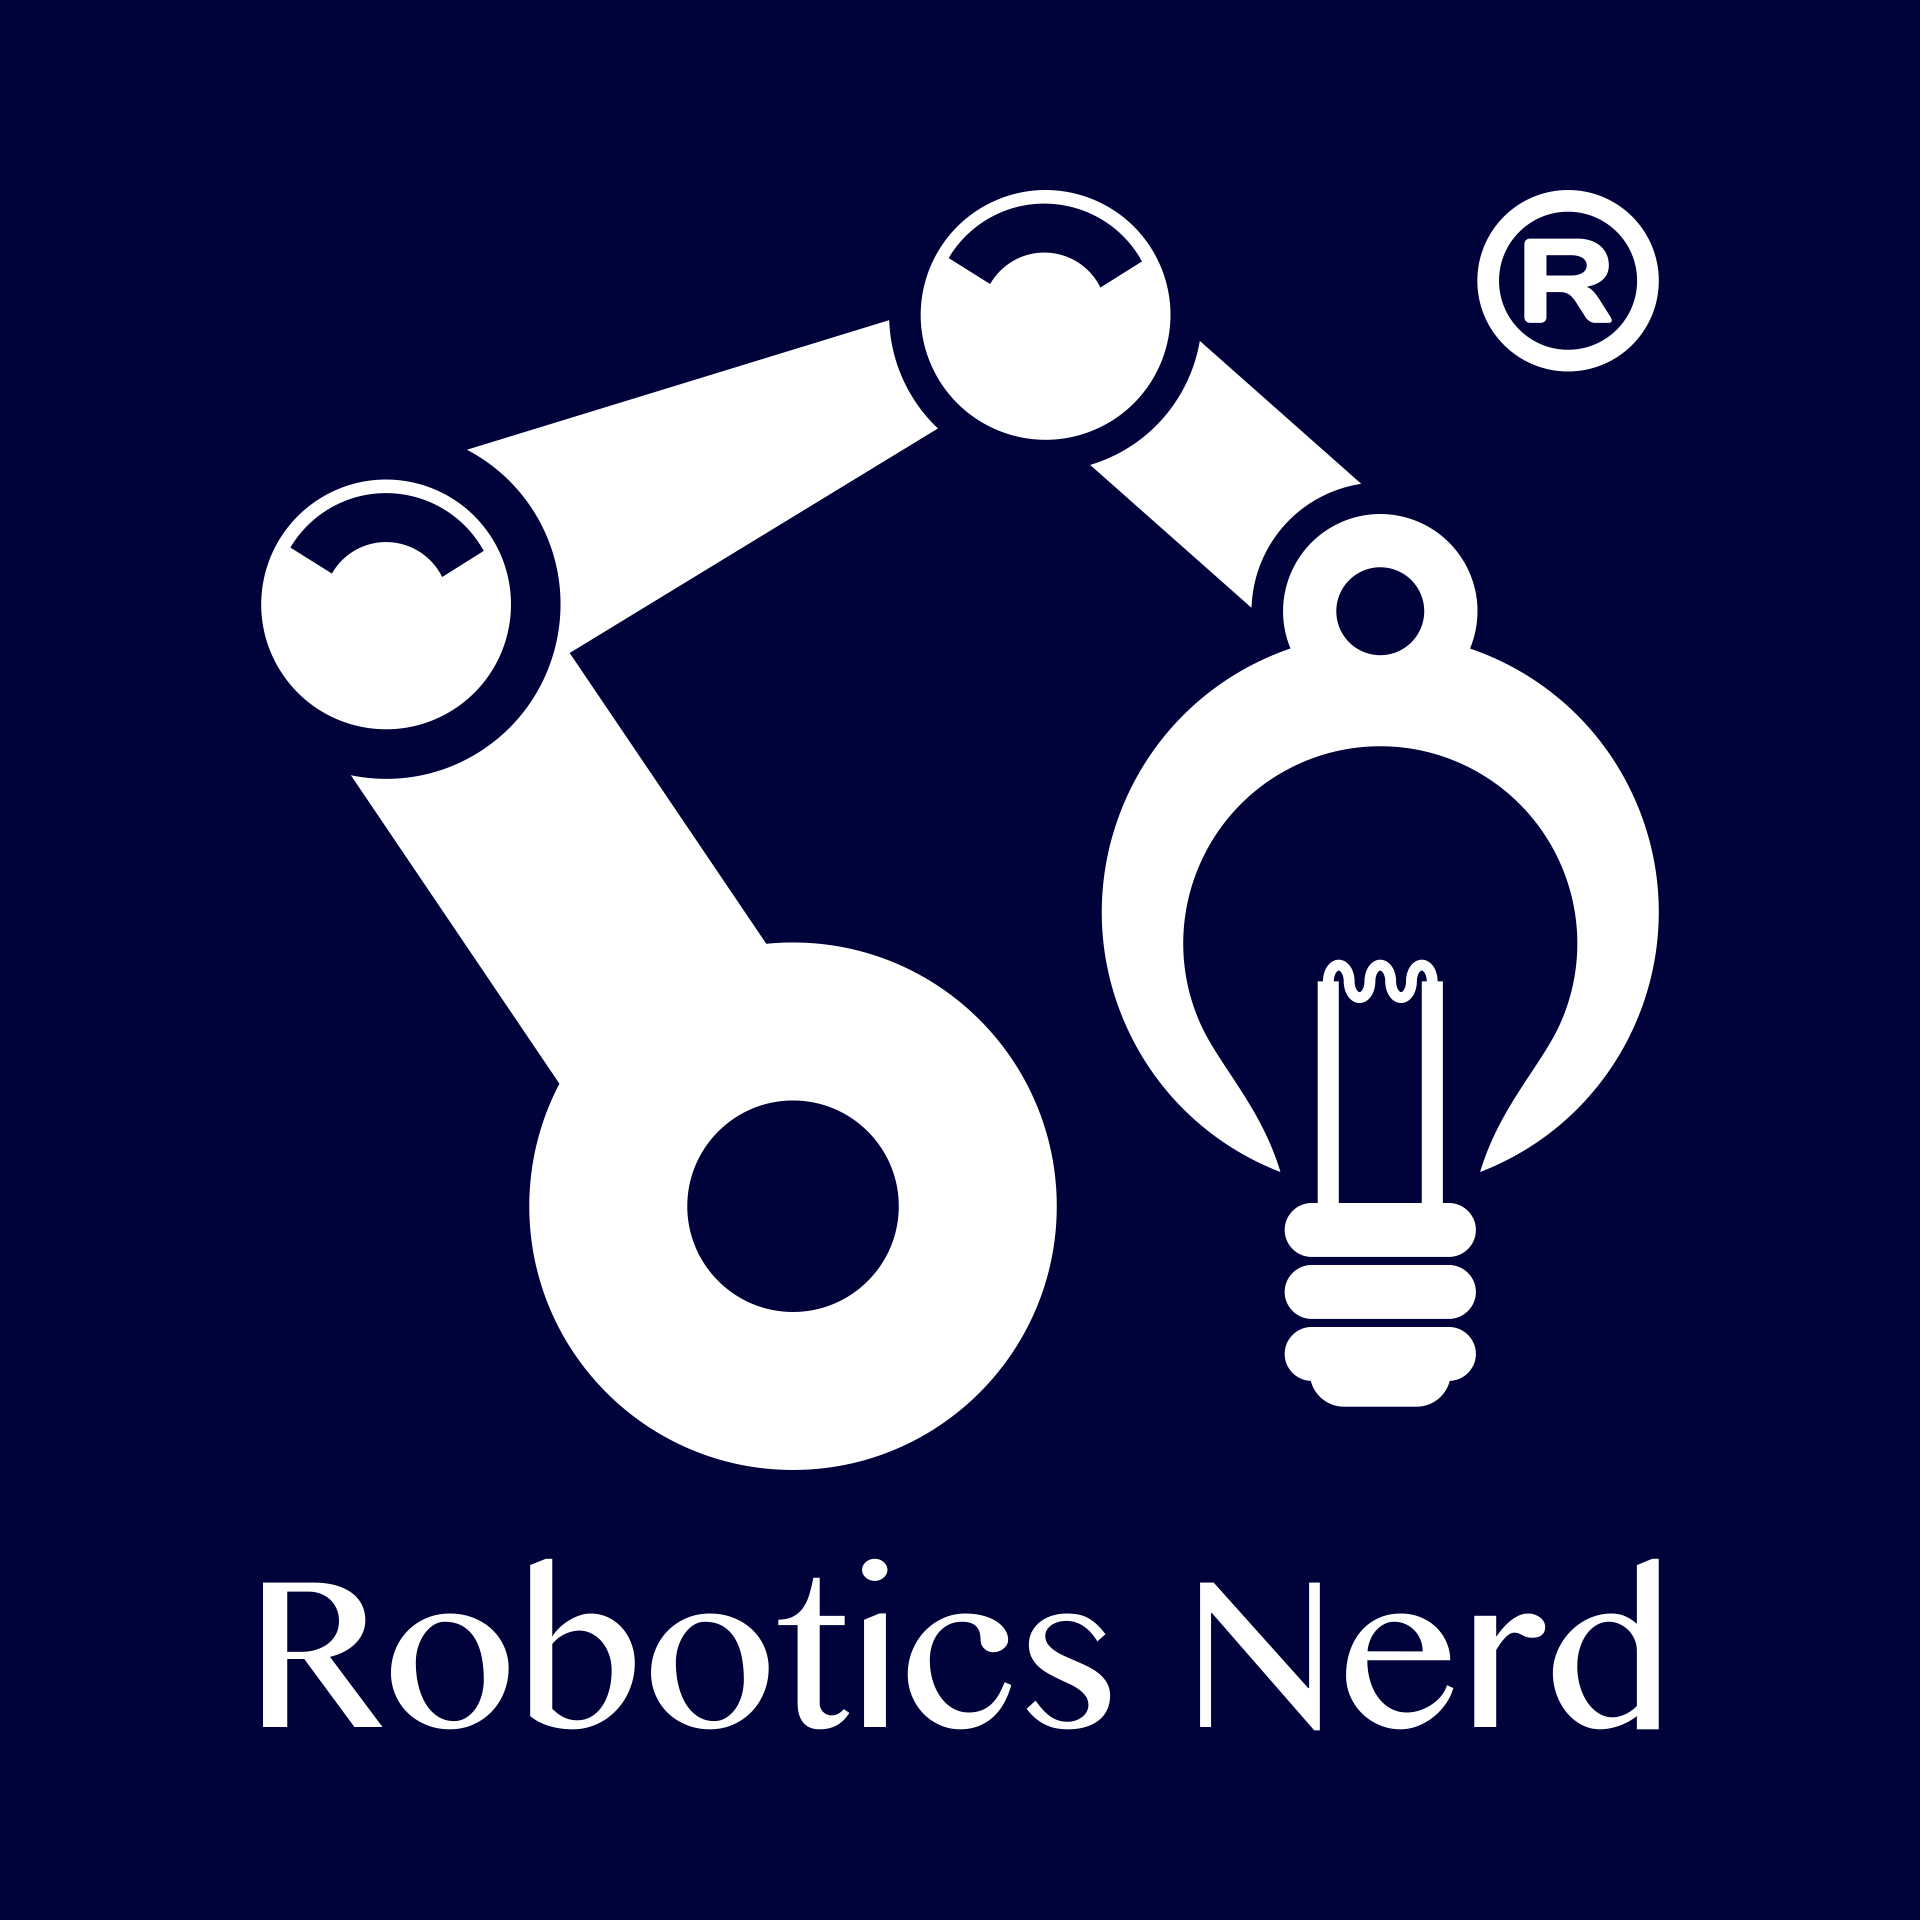 Robotics Nerd